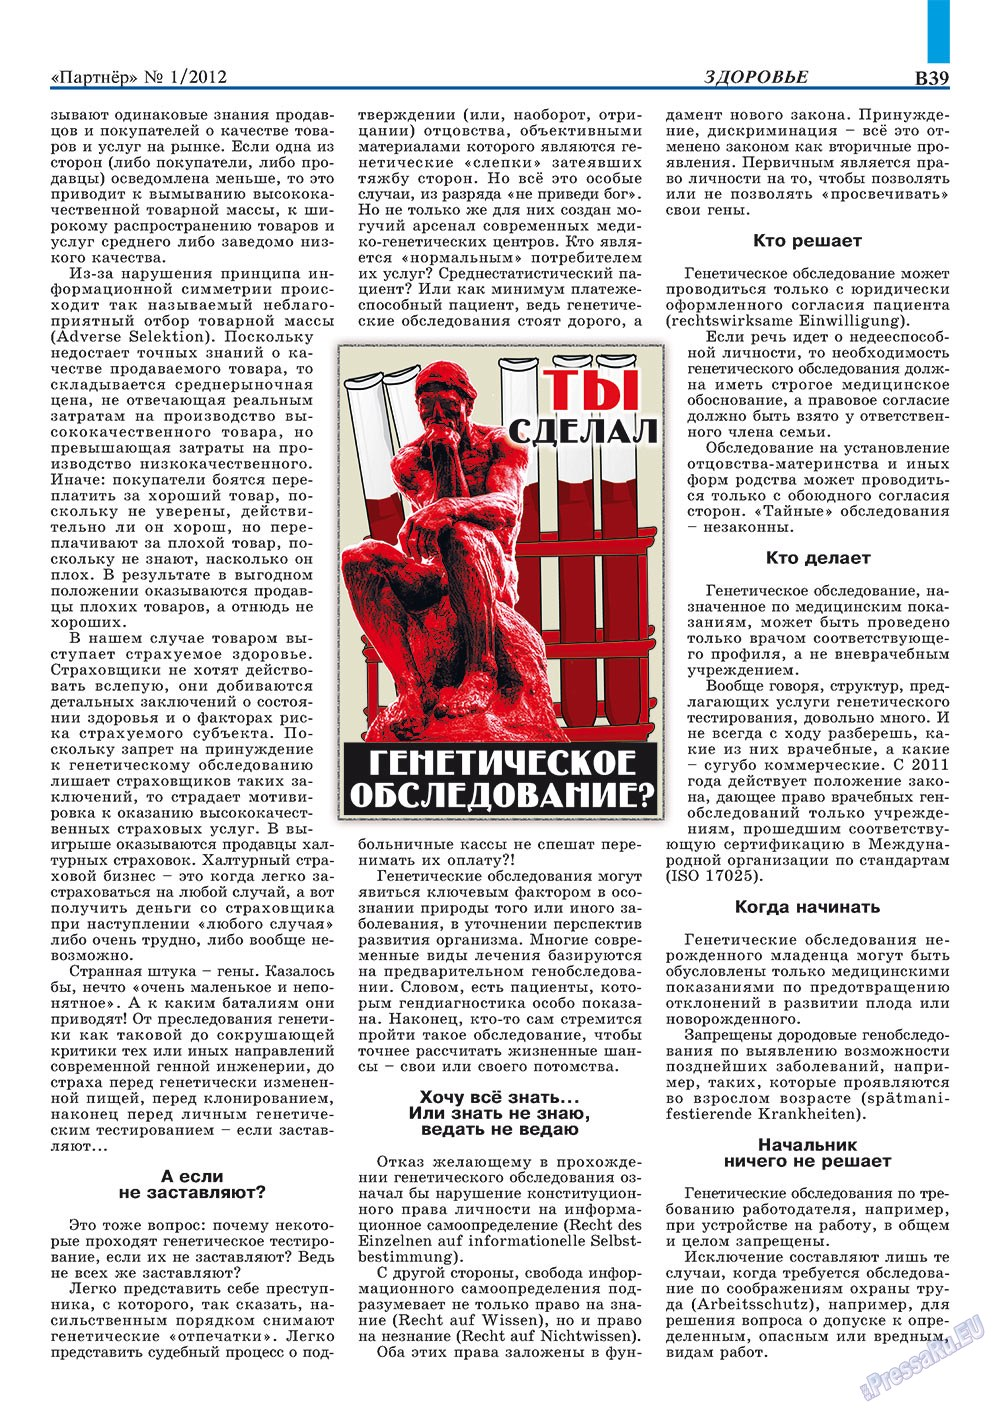 Партнер-север (журнал). 2012 год, номер 1, стр. 49